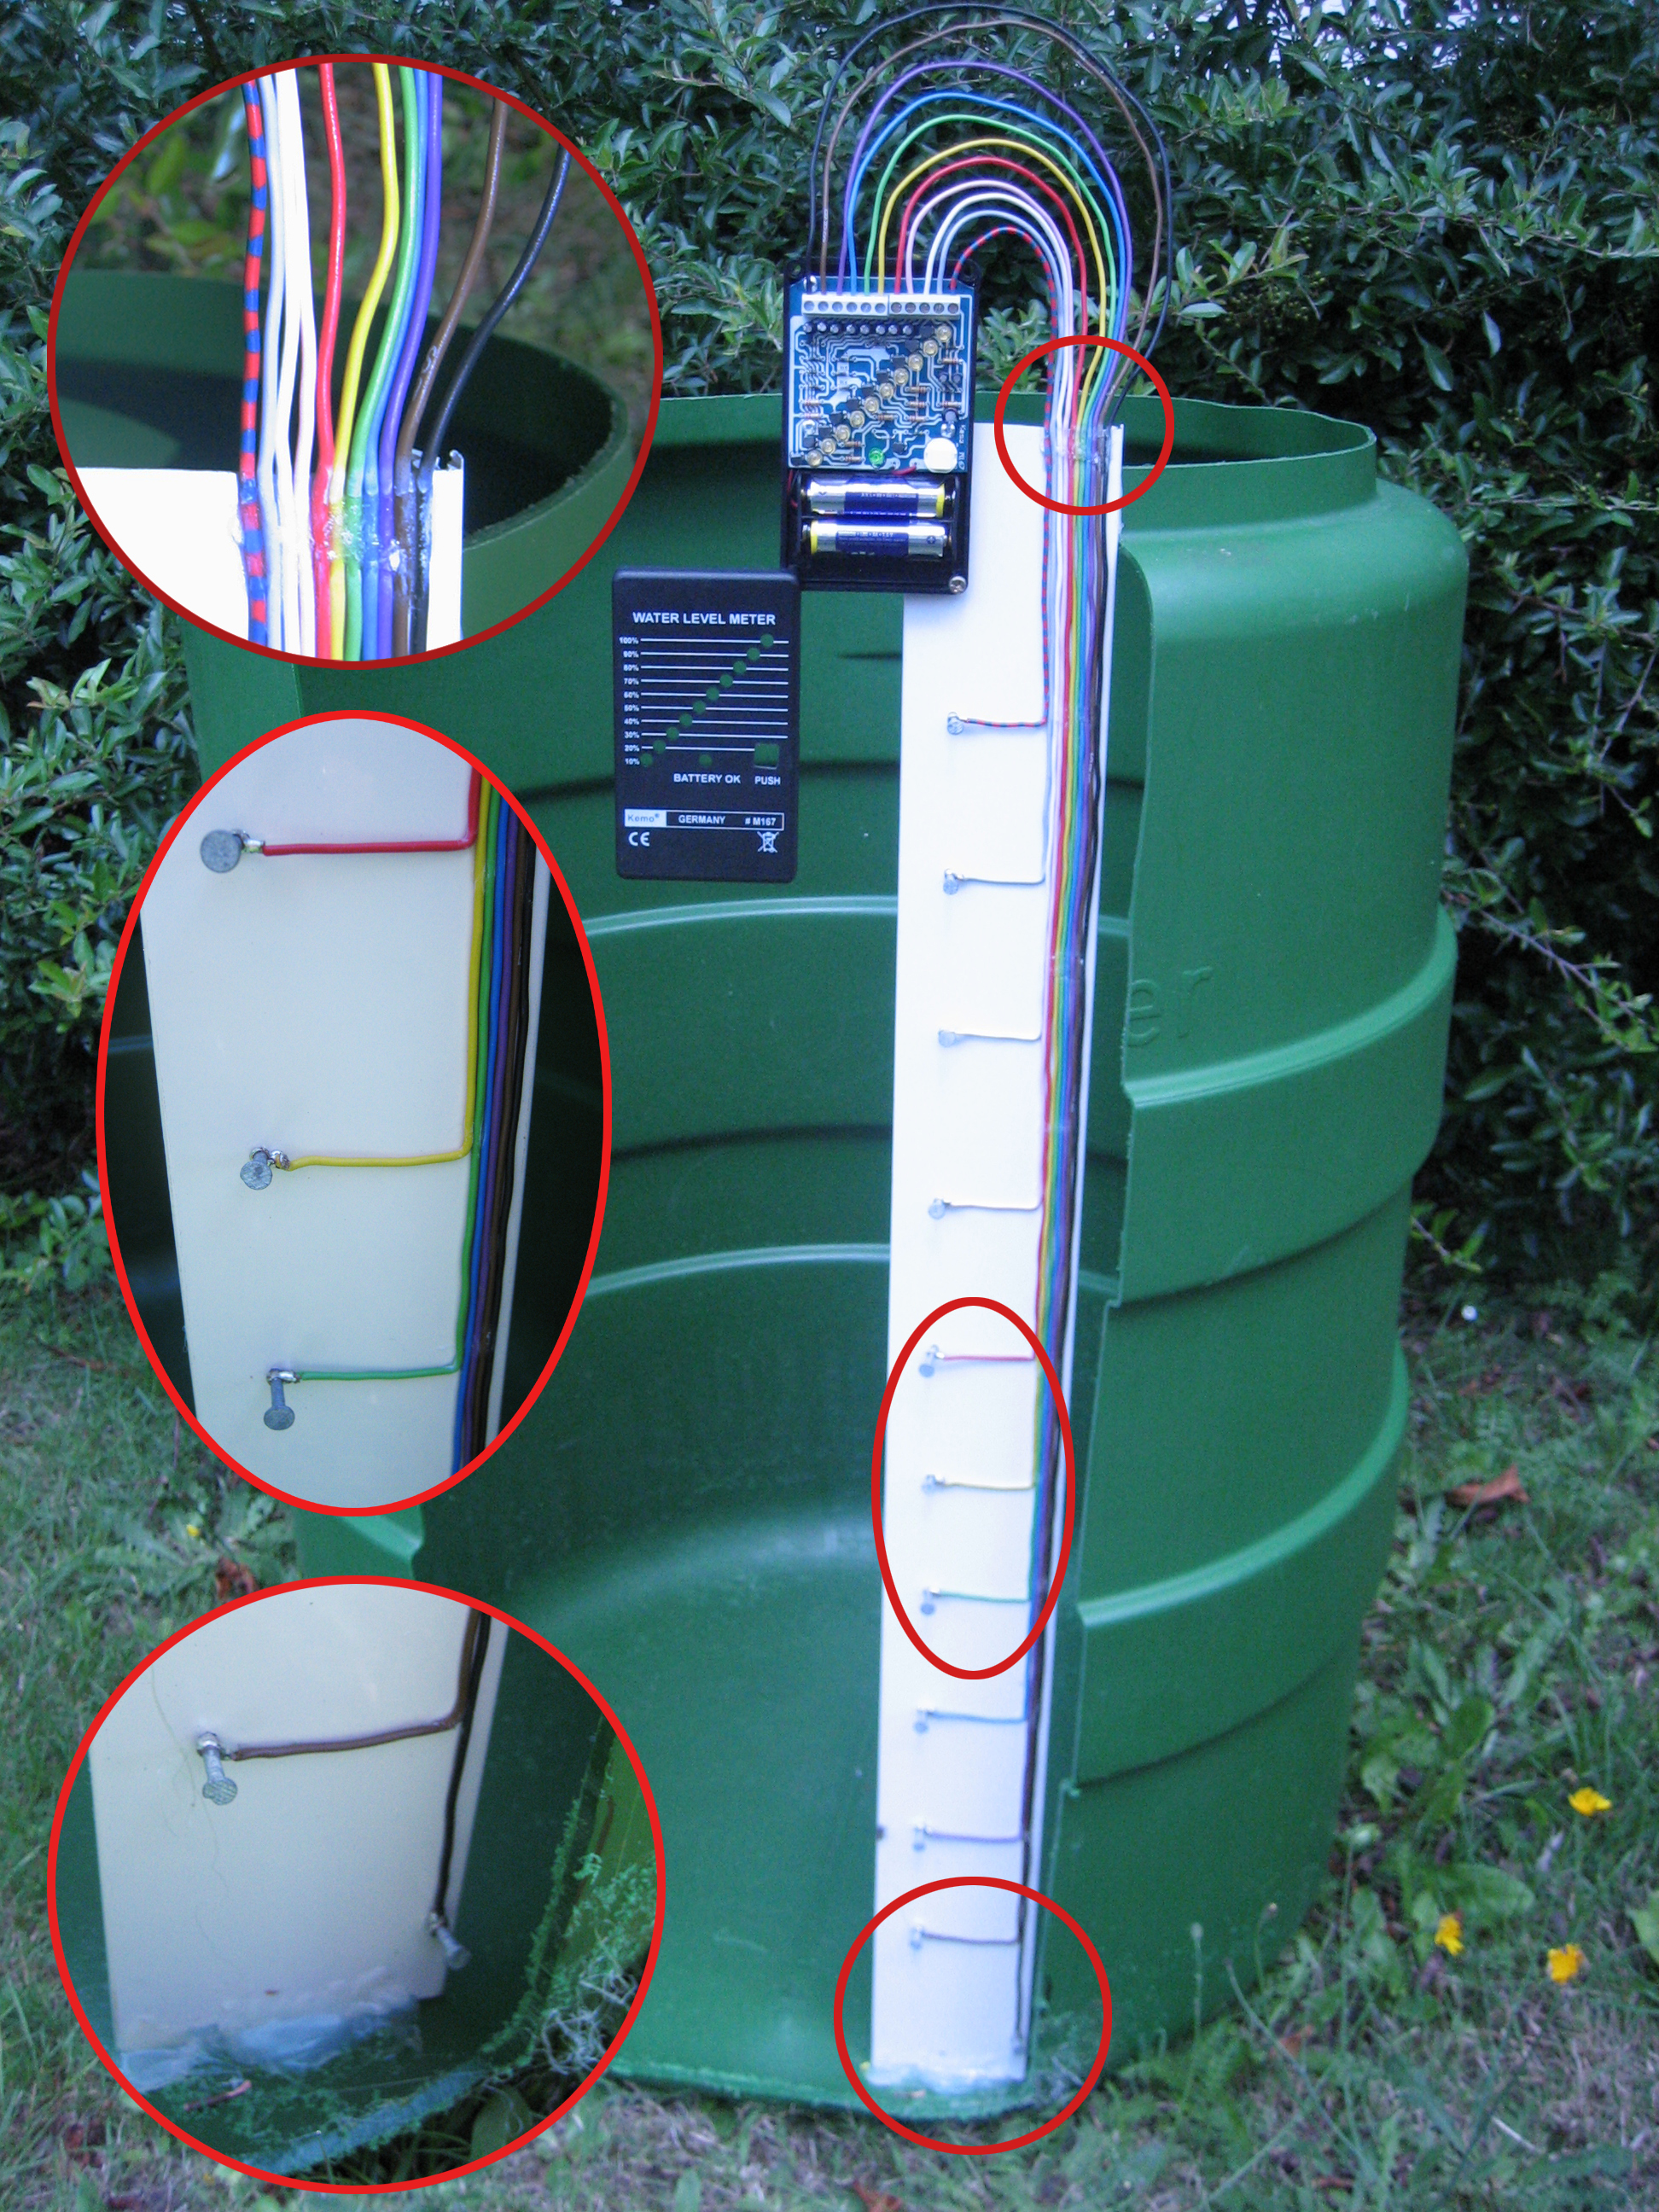 Indicador de nivel de agua en deposito for Fabricar estanque